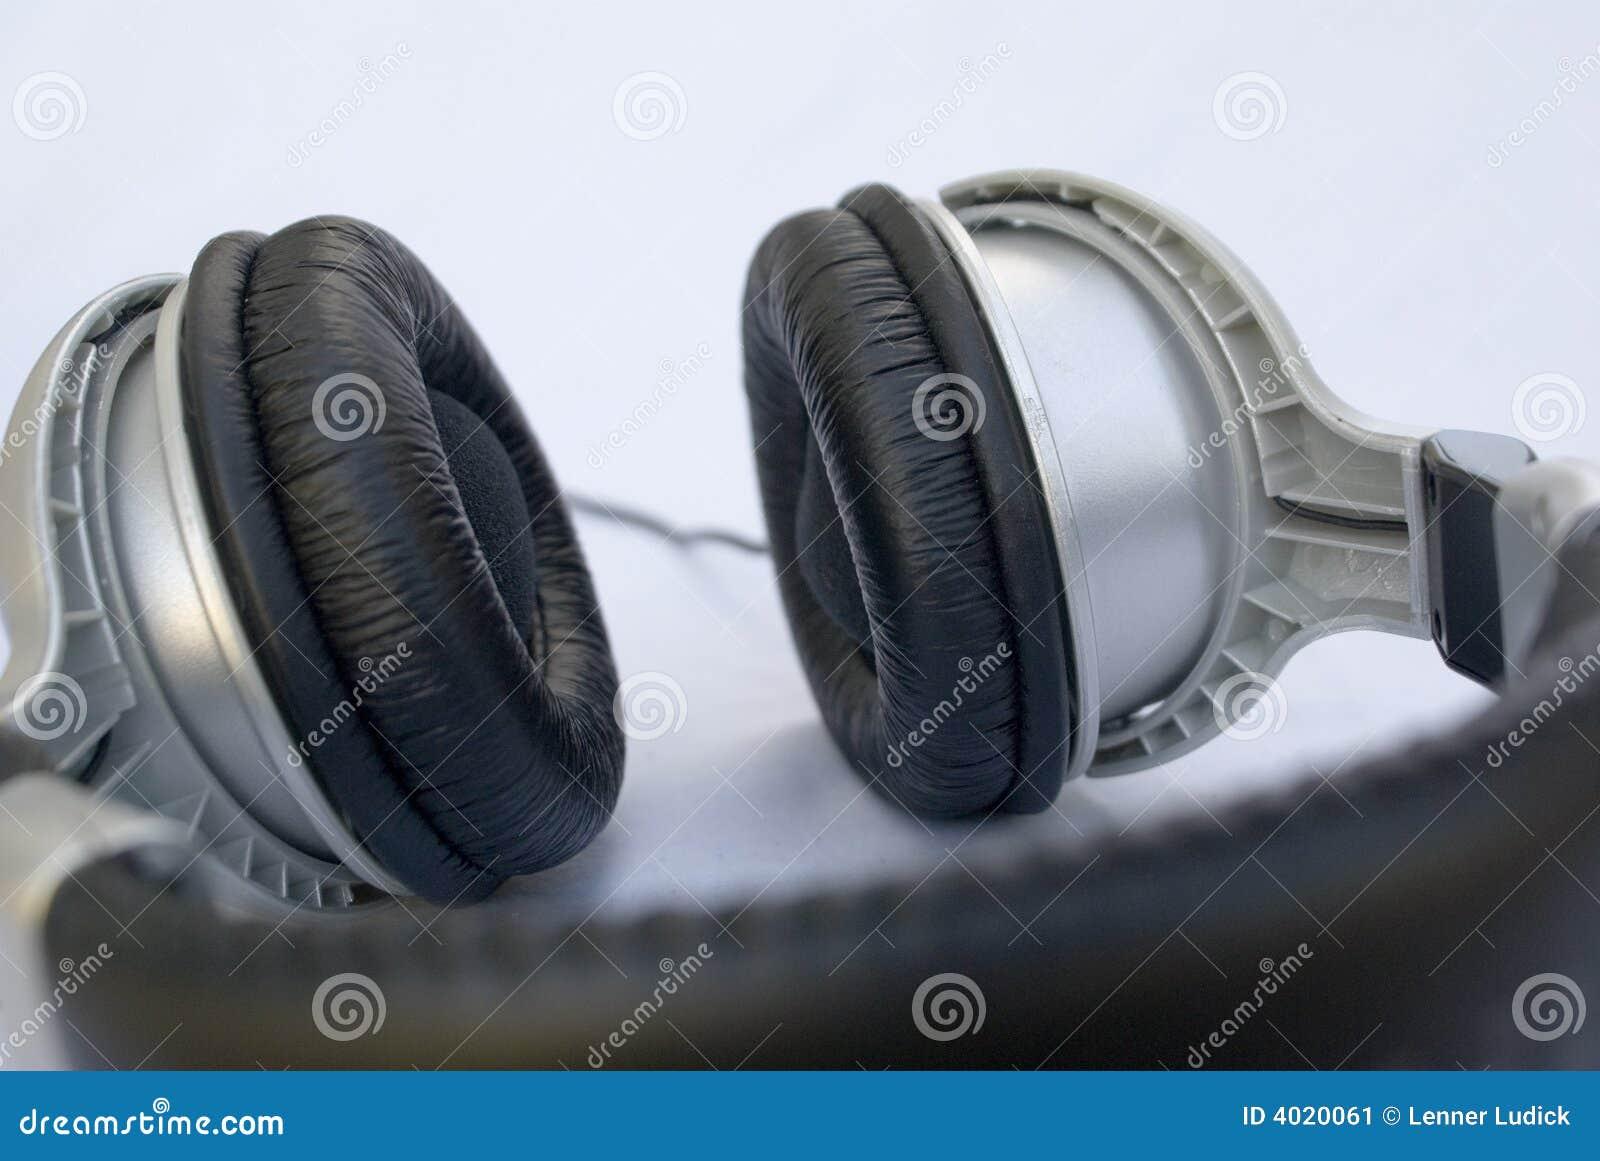 Berufskopfhörer oder Kopfhörer